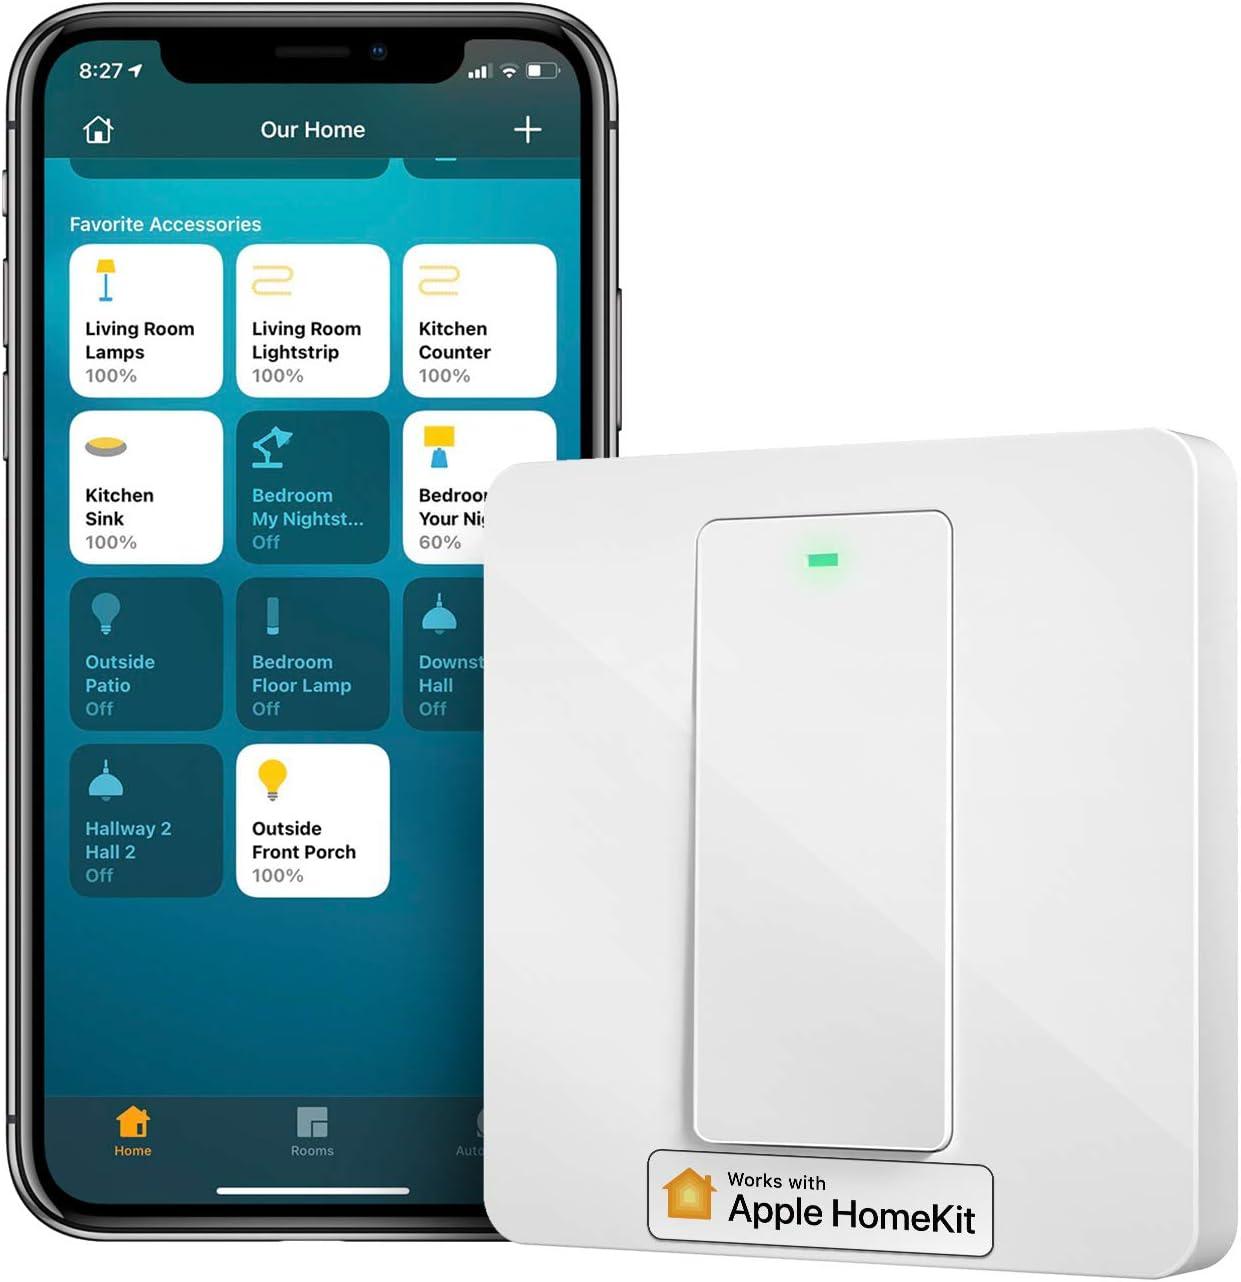 Interrupteur Connecté HomeKit (FIL NEUTRE REQUIS), Interrupteur Intelligent Compatible avec Siri, Alexa,...